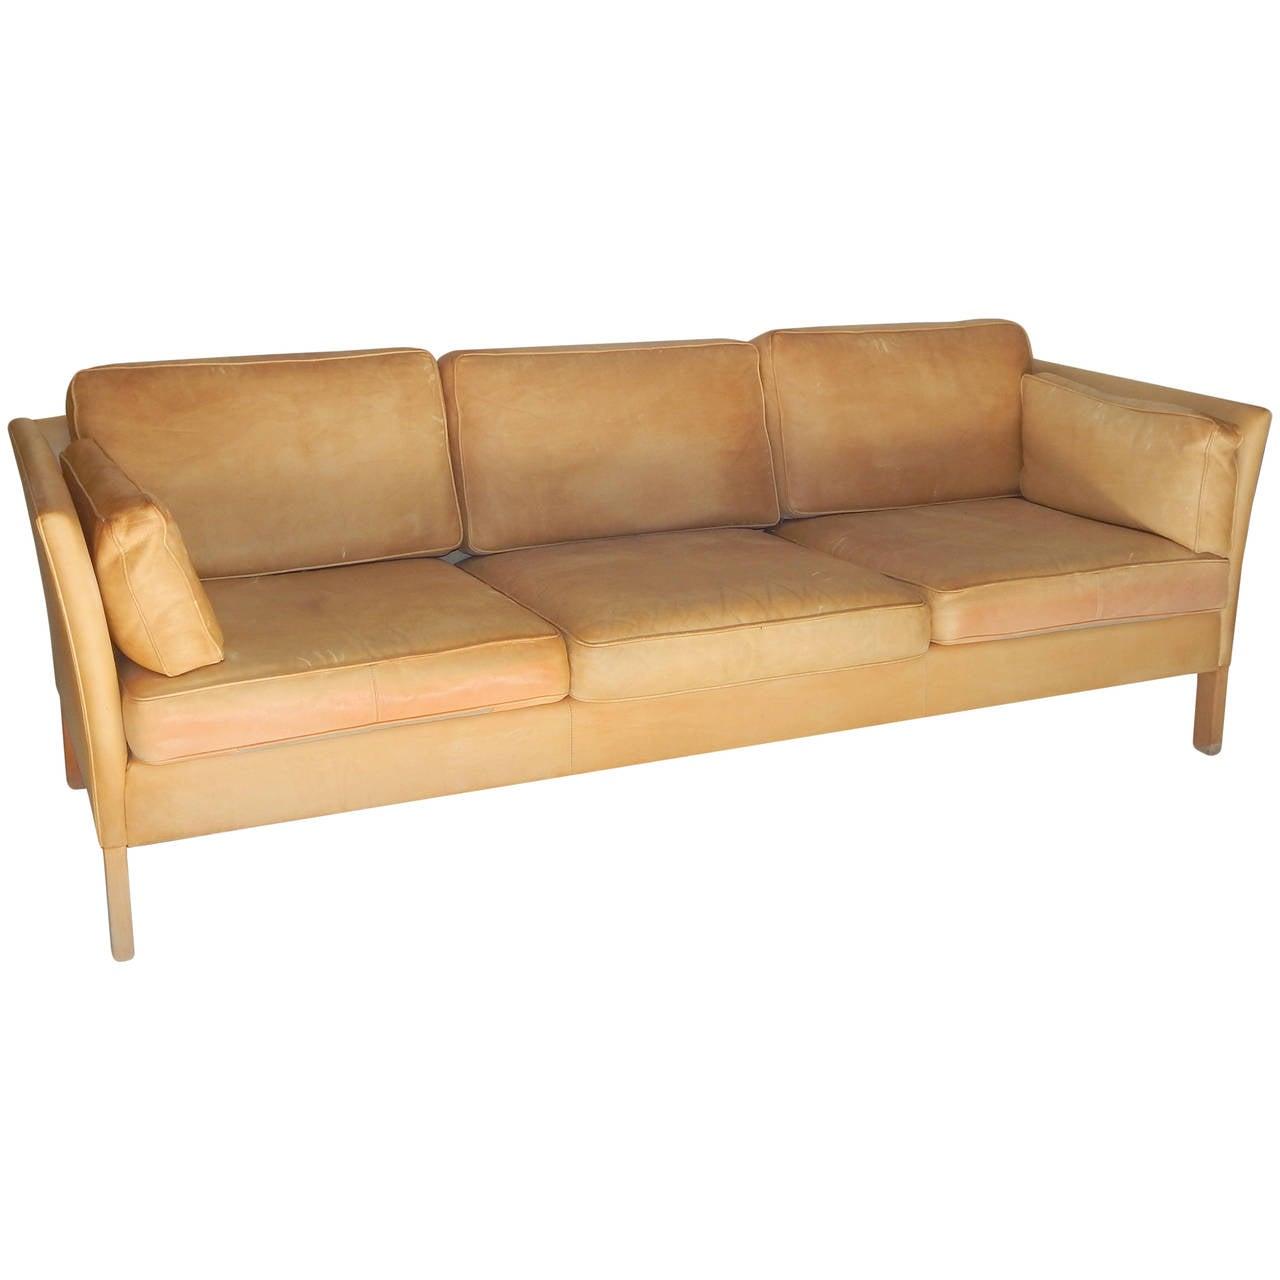 caramel colored leather sofas grey crushed velvet corner sofa uk borge morgensen image 2